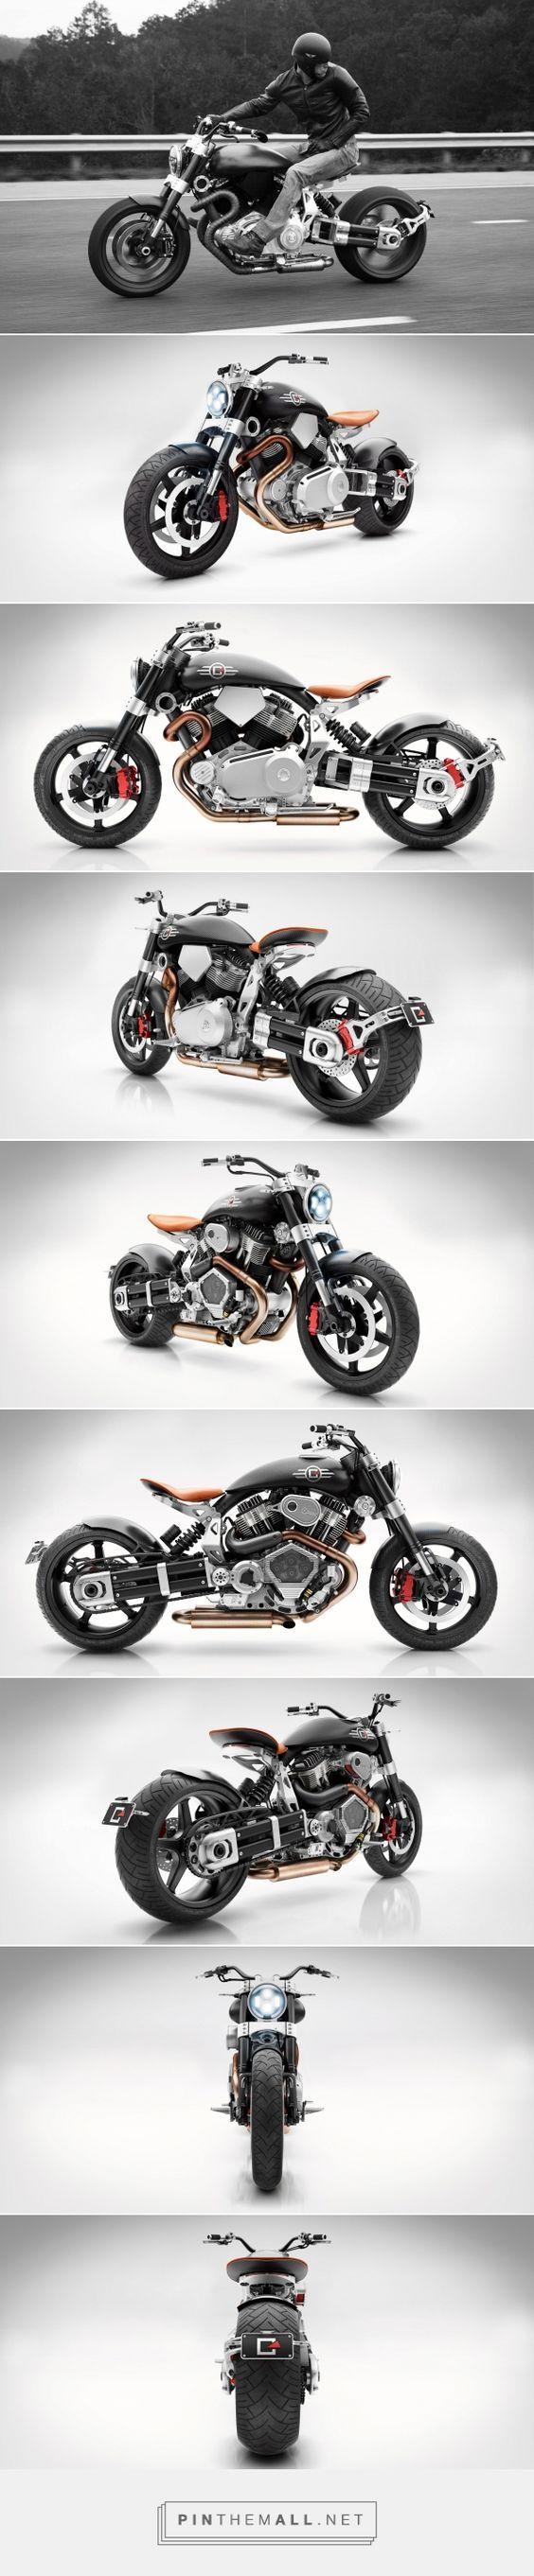 Hellcat | Confederate Motorcycles: